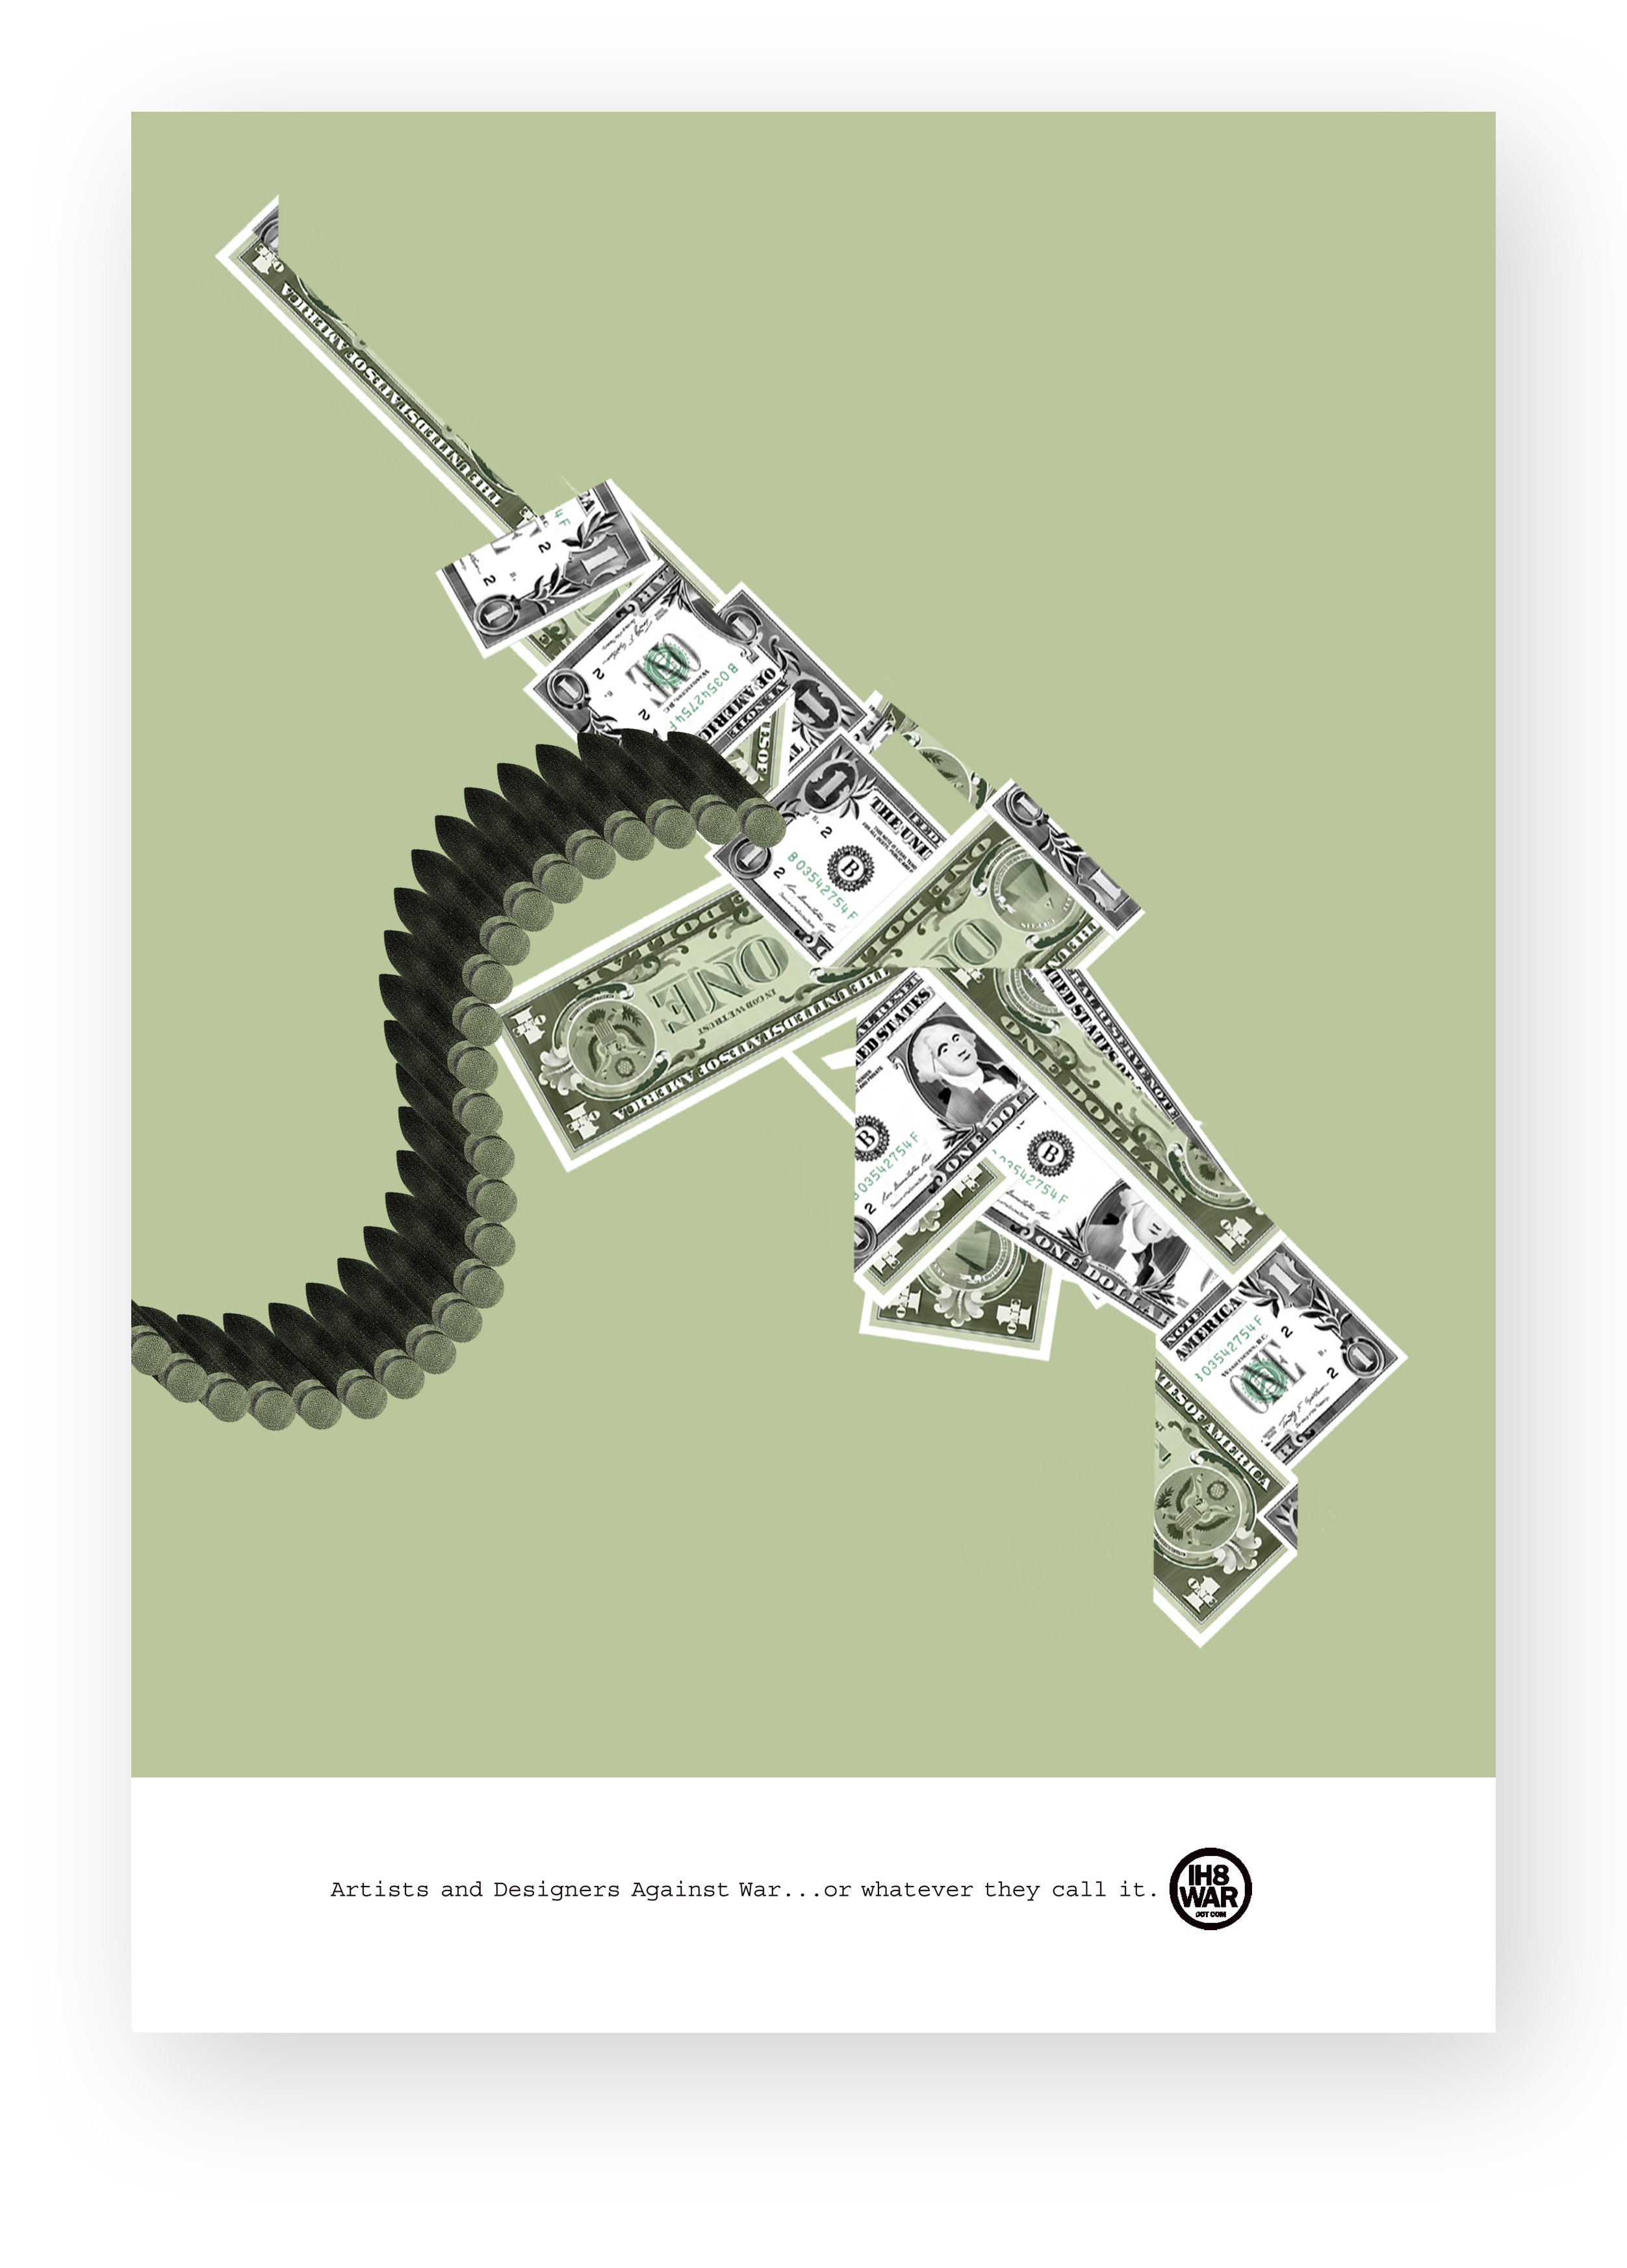 giulio bonasera war money conceptual illustration